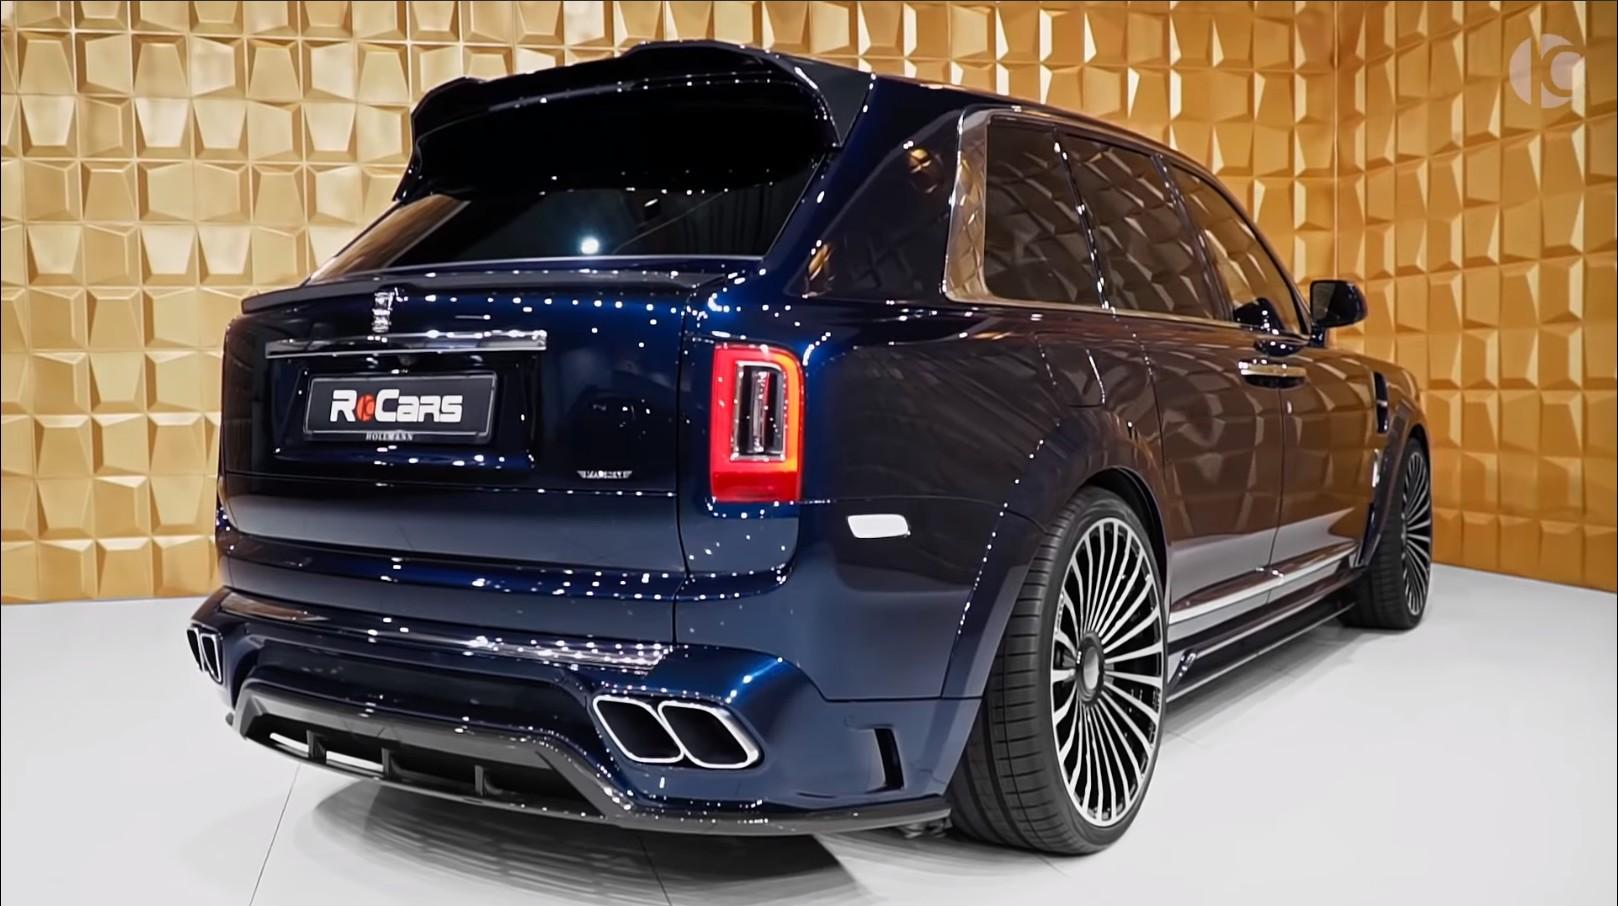 2020 Mansory Rolls Royce Cullinan